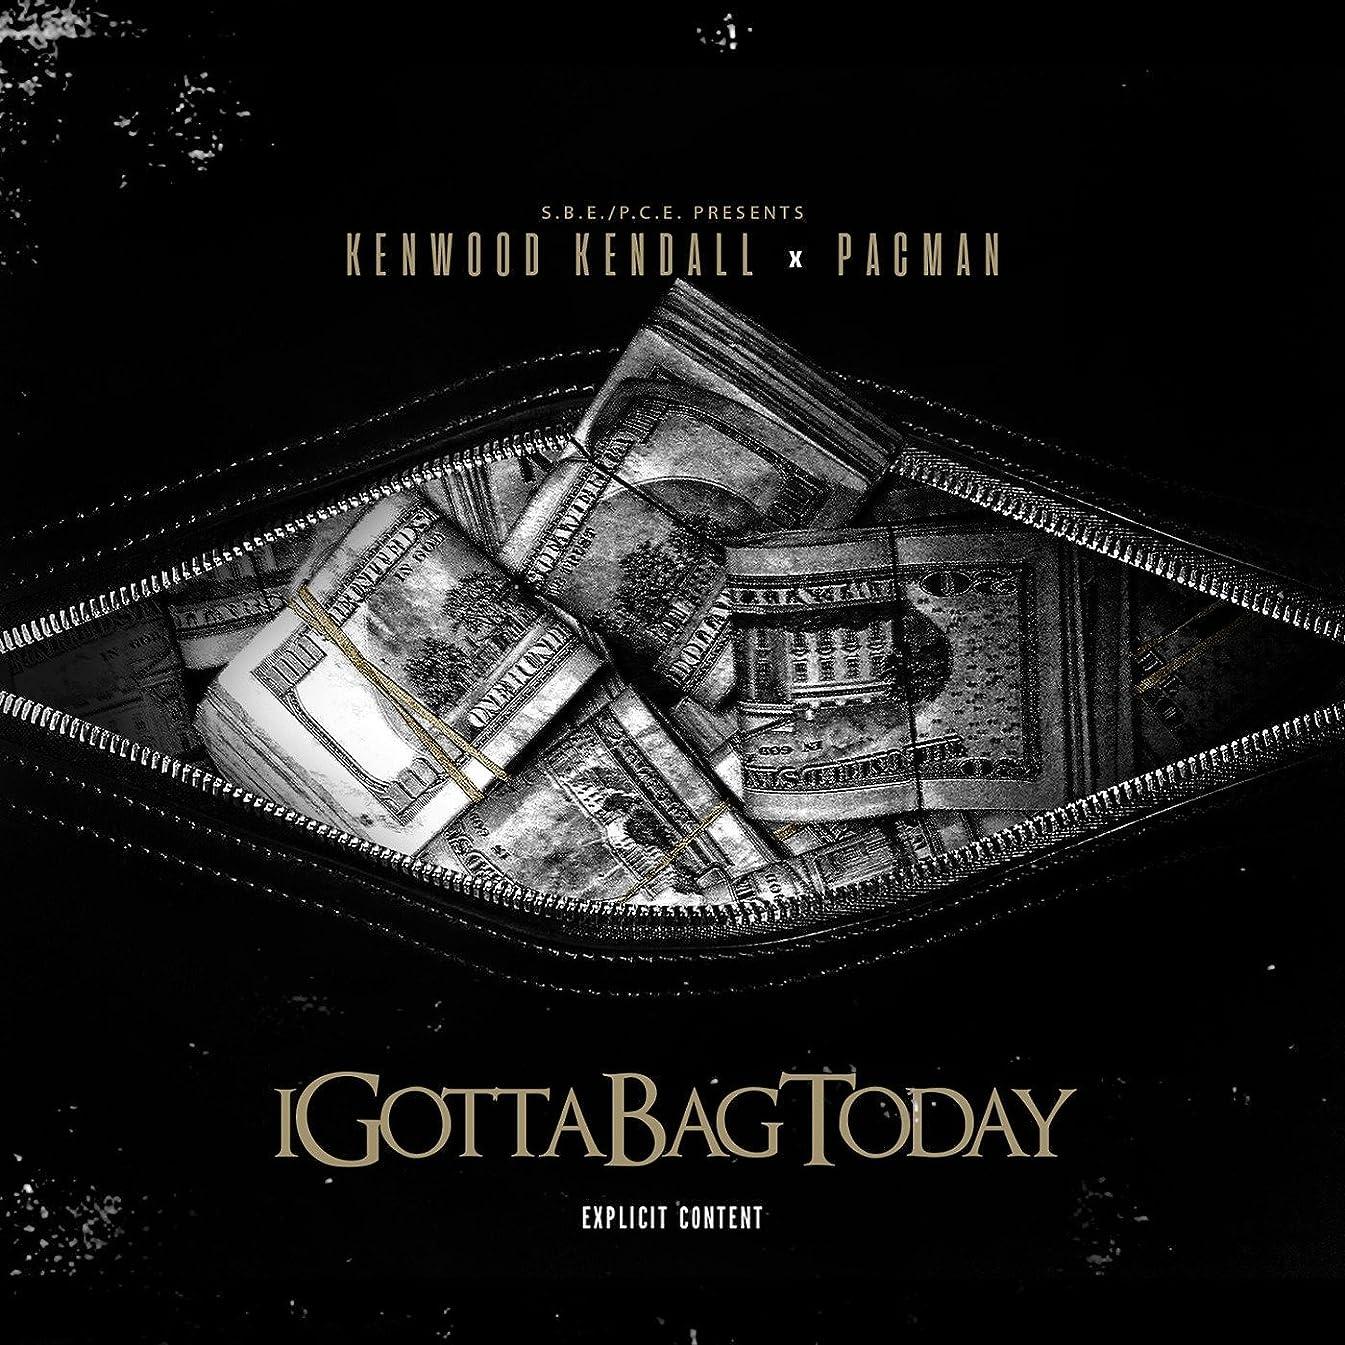 I Gotta Bag Today [Explicit]